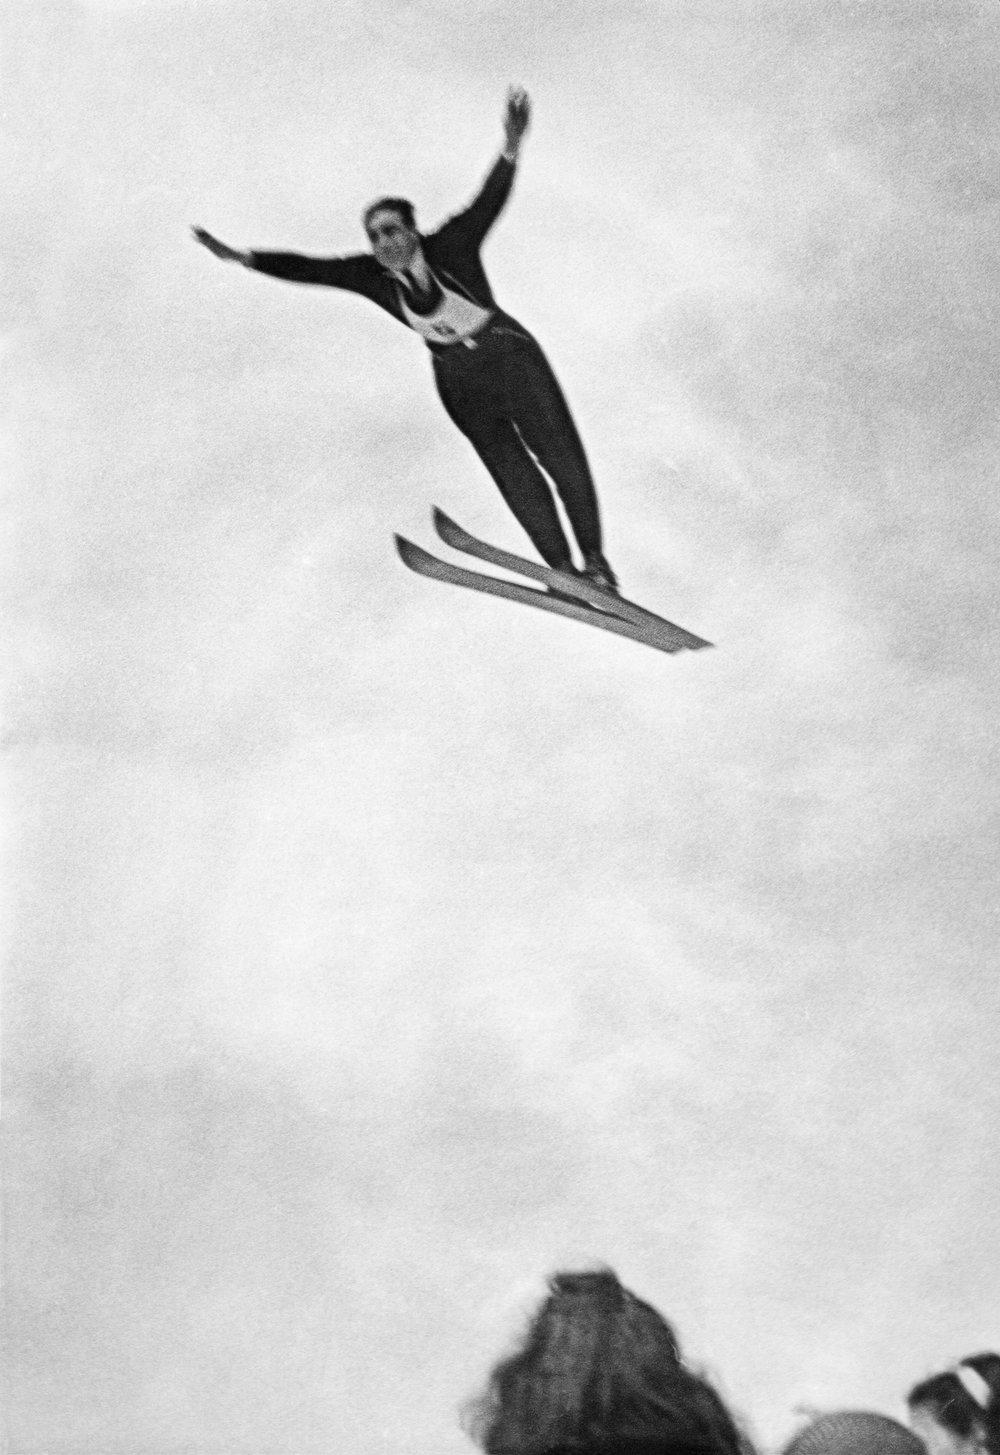 Samuel & Martha Pletsch's son, ski jumper Earle Pletsch, 1947.